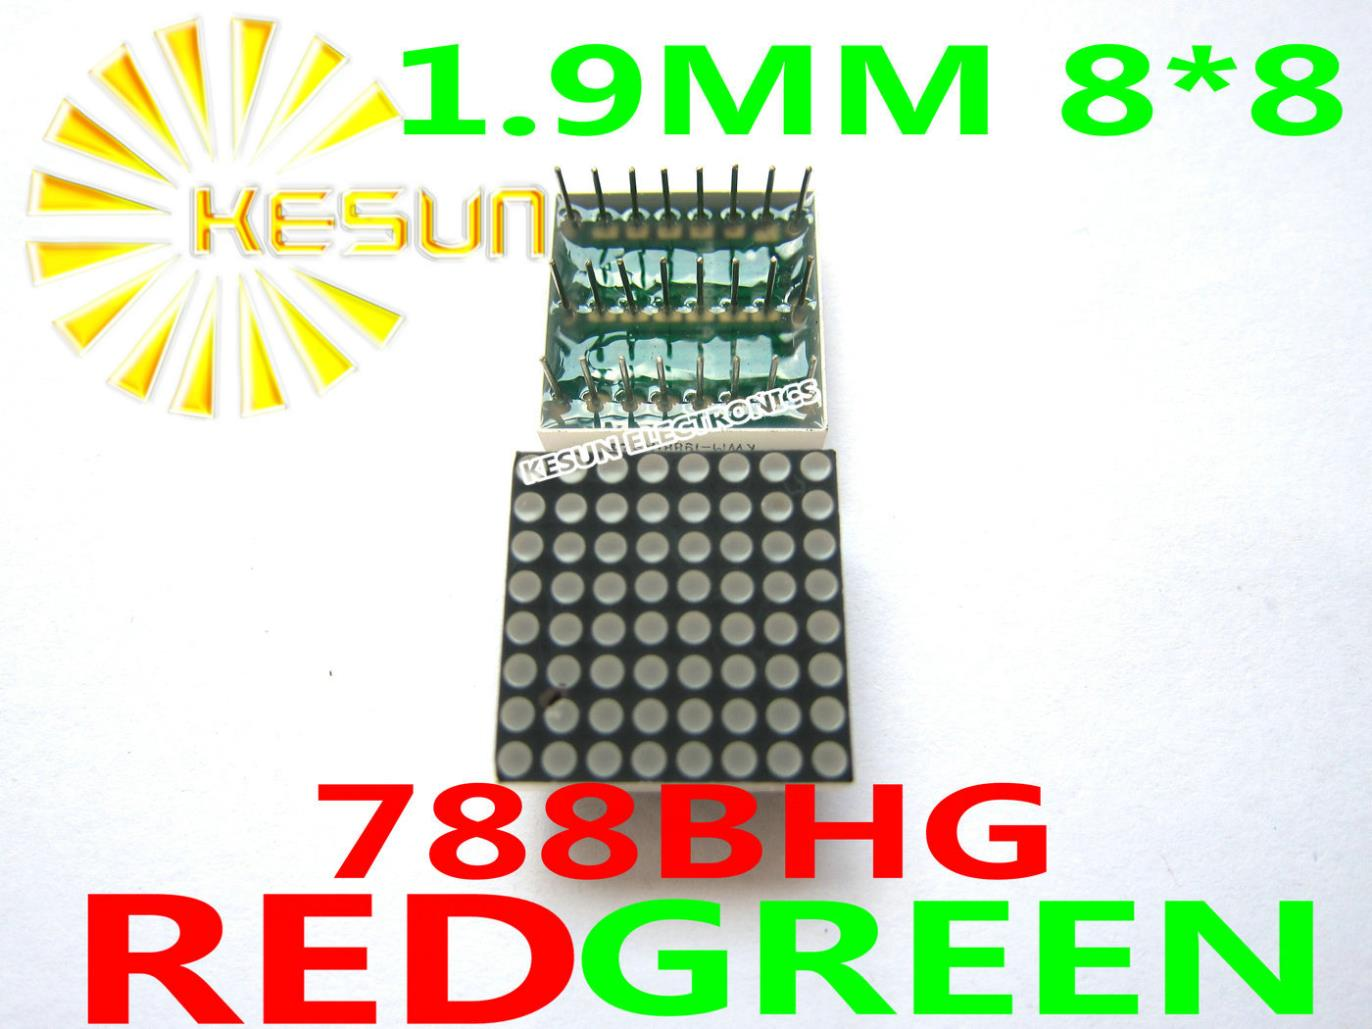 50 piezas 1,9 MM 8X8 rojo verde bicolor 20*20 LED Dot Matrix Digital tubo módulo de pantalla LED 788BHG 78ahg Hontiey UV púrpura LED de alta potencia Chip 360Nm 375Nm 385Nm 395Nm 405Nm UVA UVB cuentas de iluminación 3 5 10 20 30 50 100 vatios matriz 3D